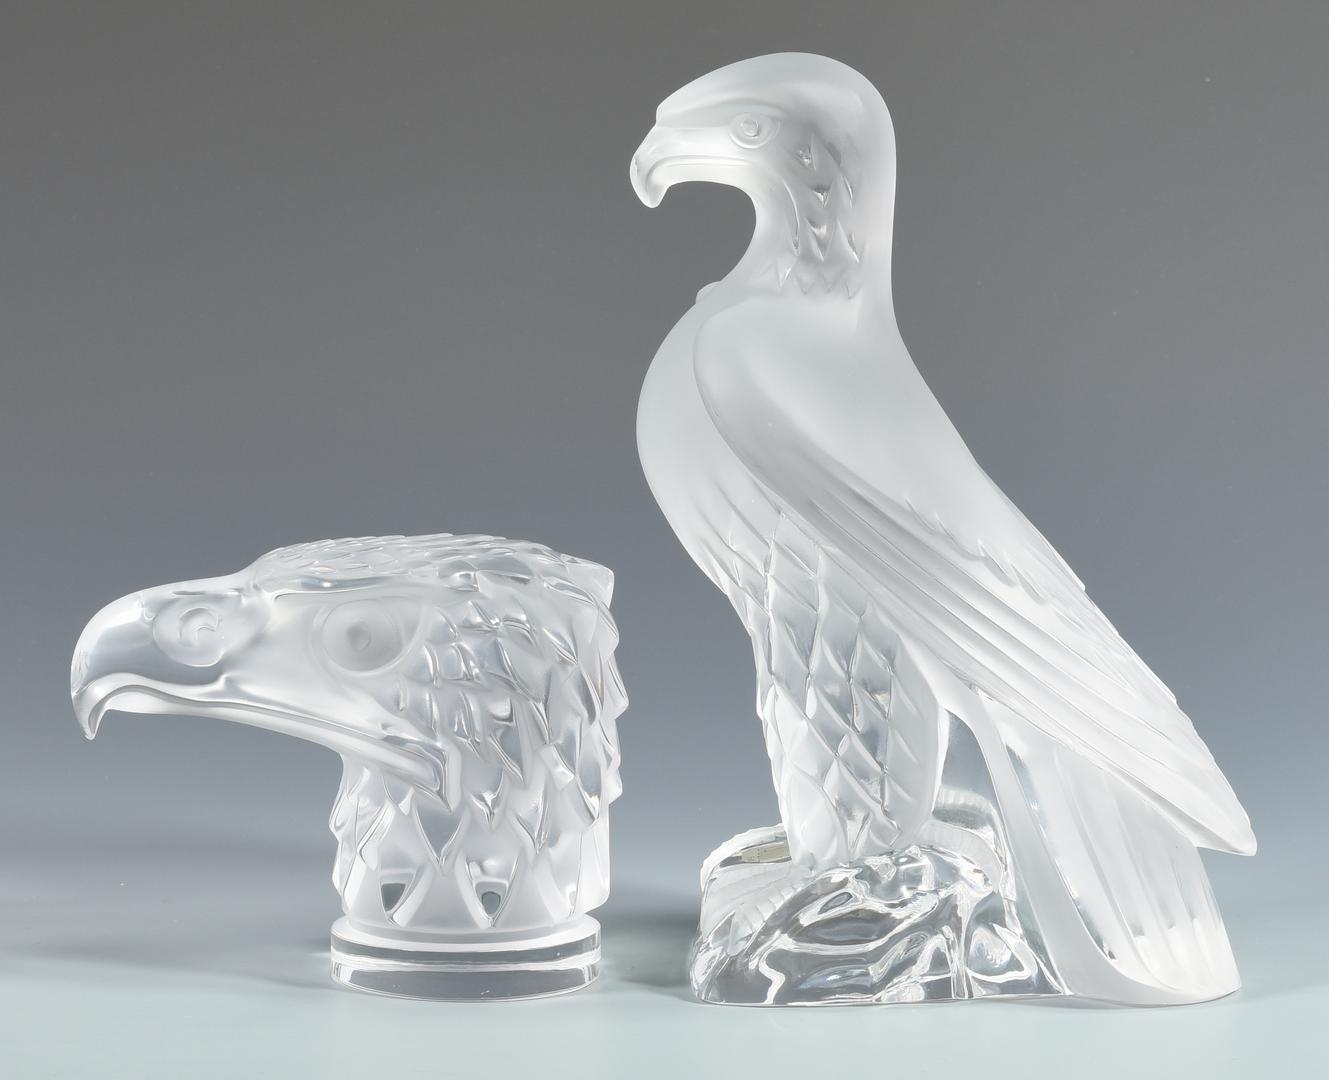 Lot 508 Lalique Glass Eagle Sculpture Paperweight